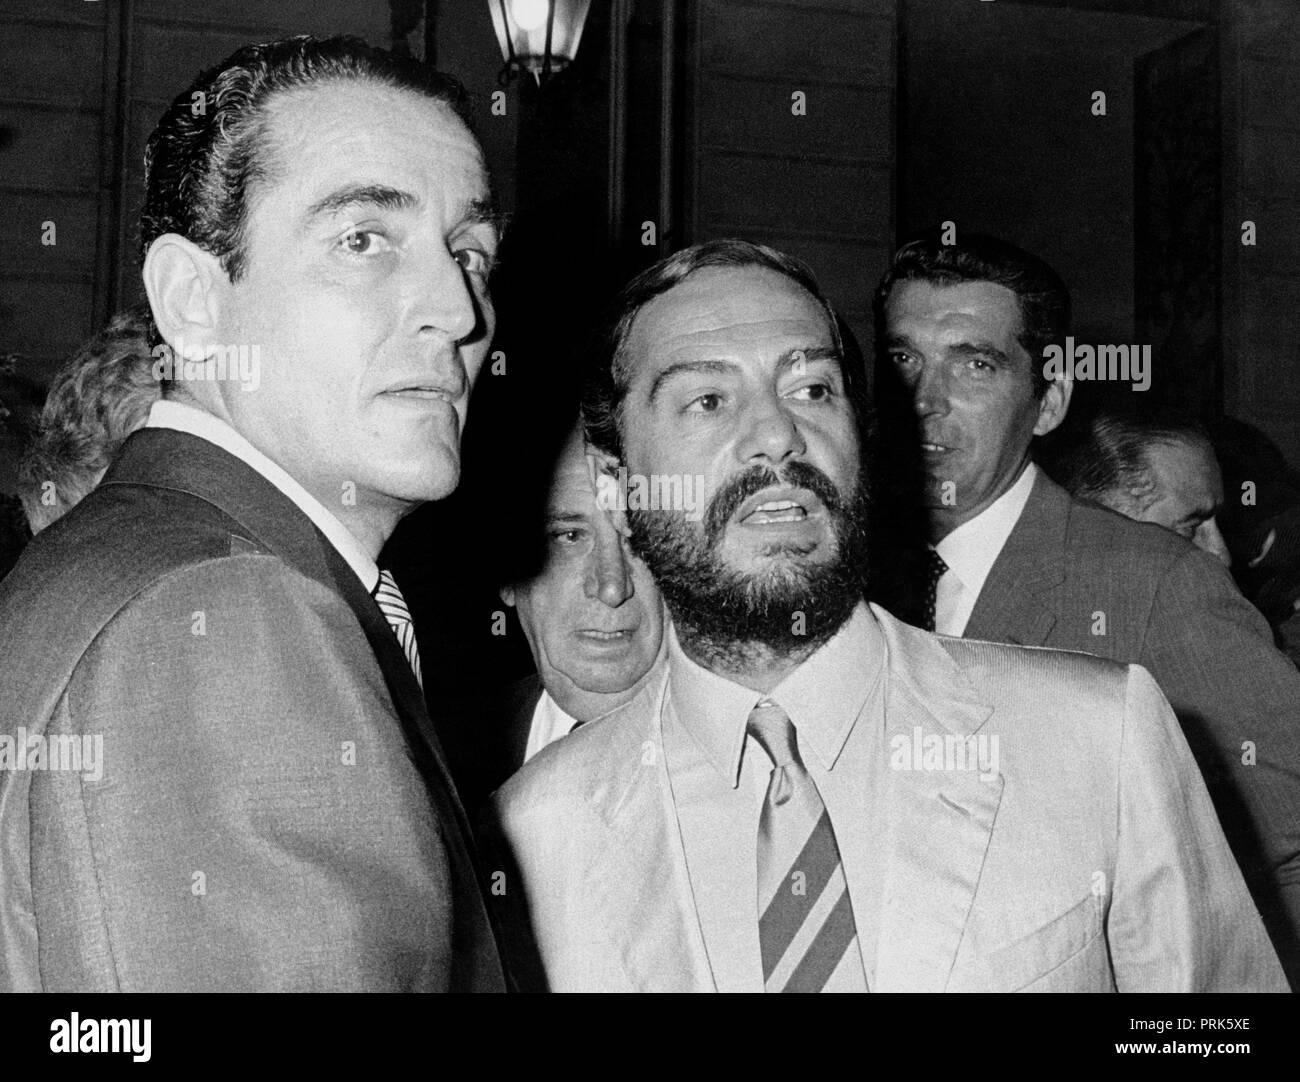 Vittorio Gassman Nino Manfredi 1968 Stockfotografie Alamy